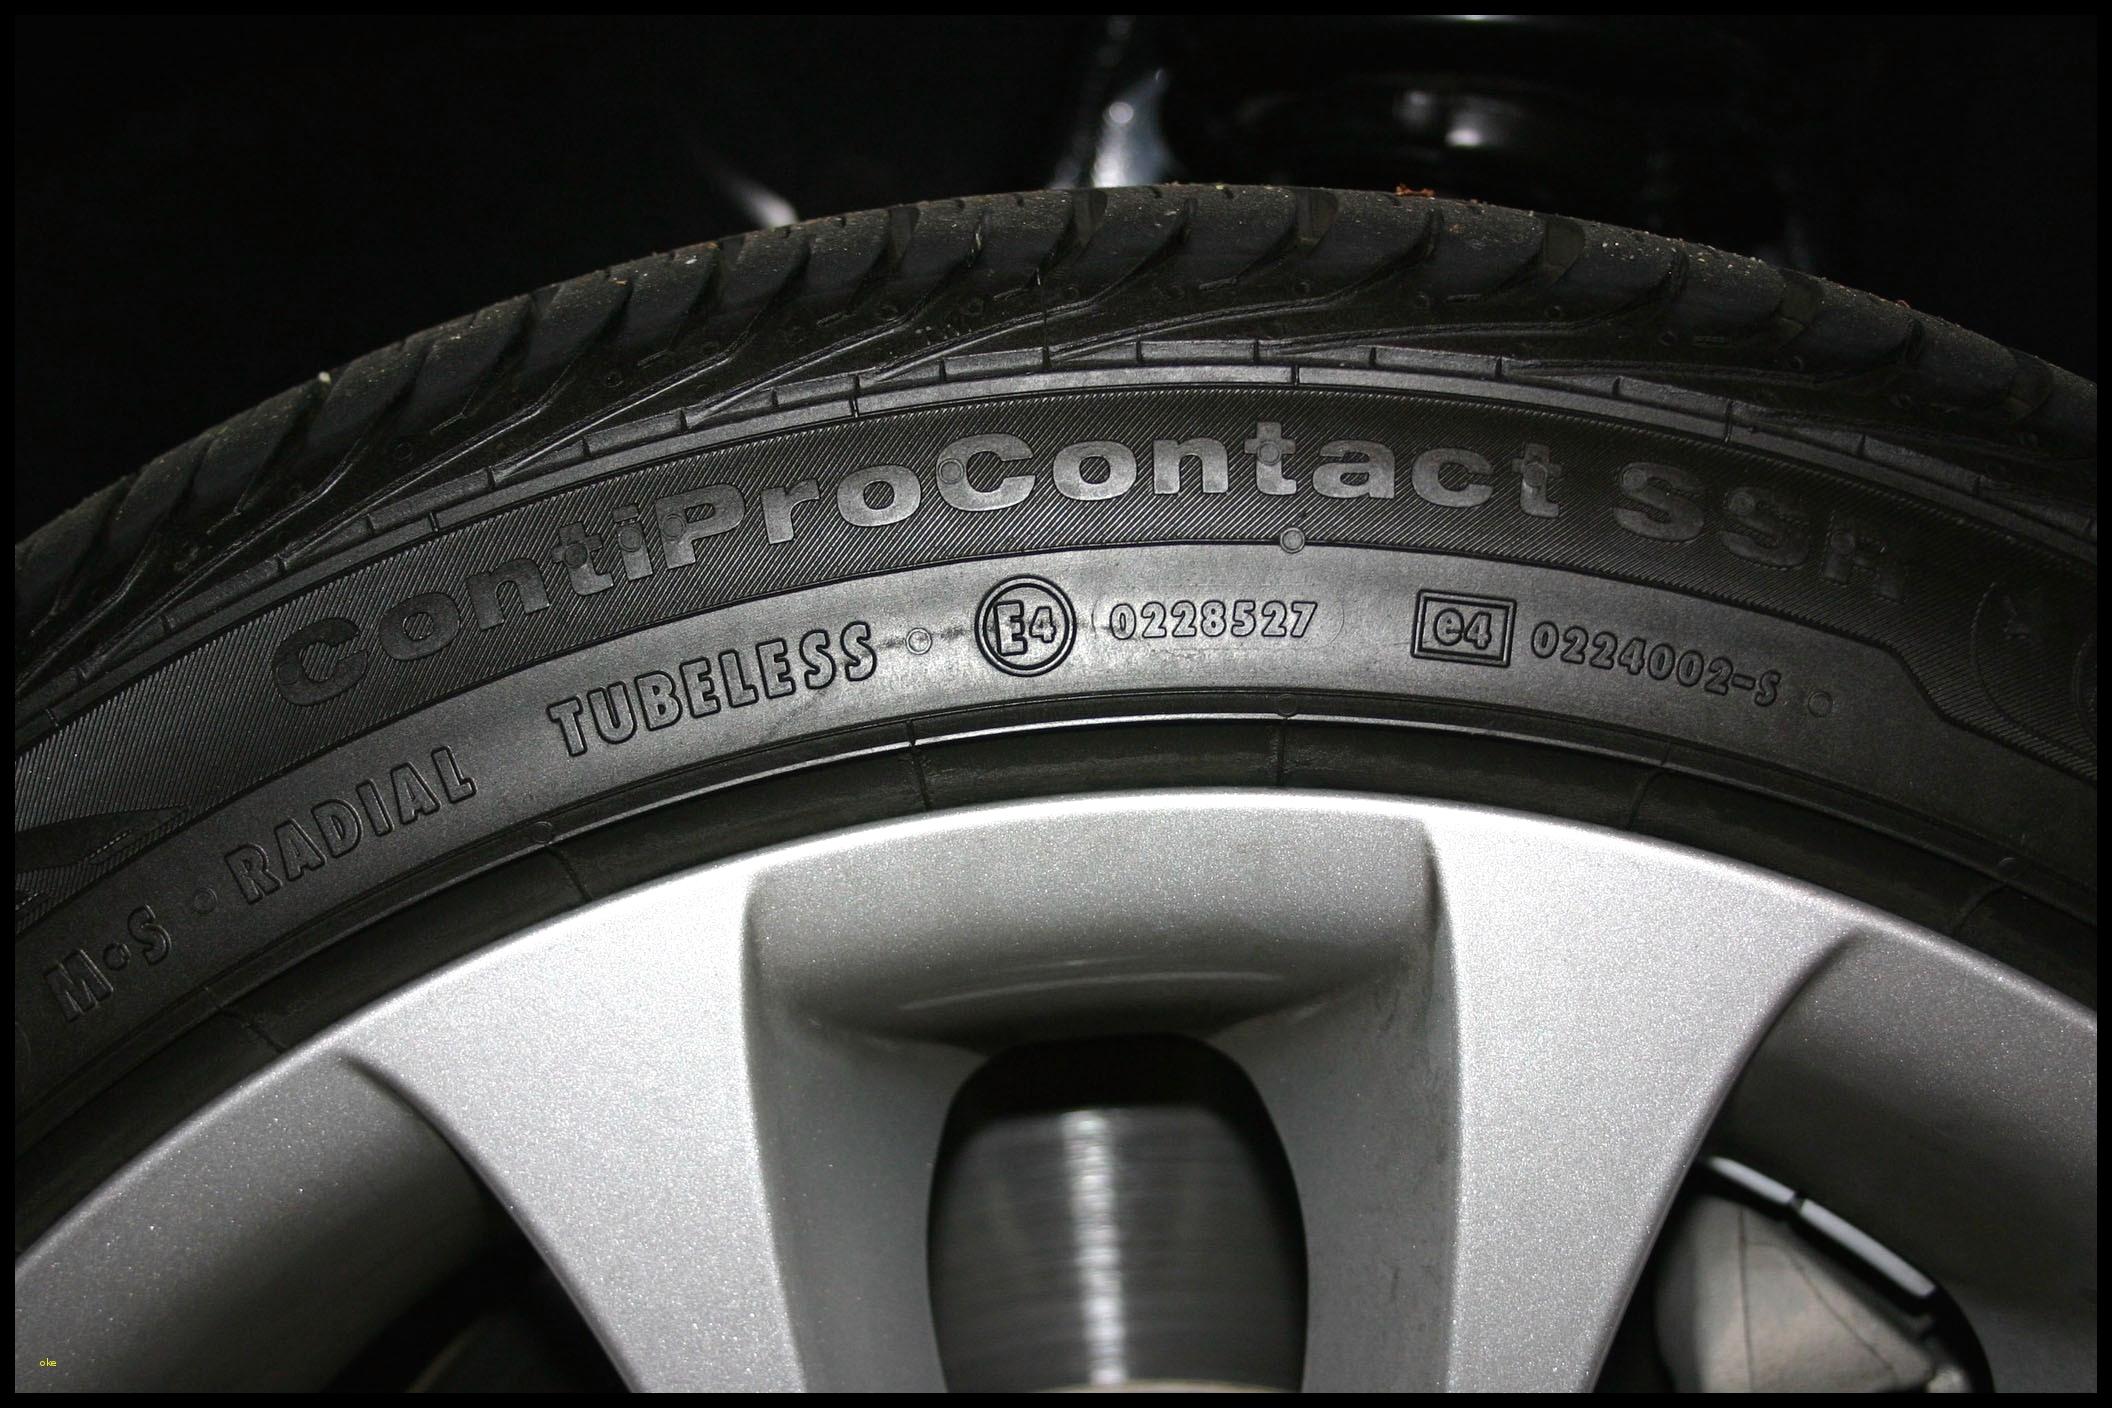 Run Flat Tires Continental Bmw Elegant Interesting Run Flat Tires for Bmw – Aratorn Sport Cars